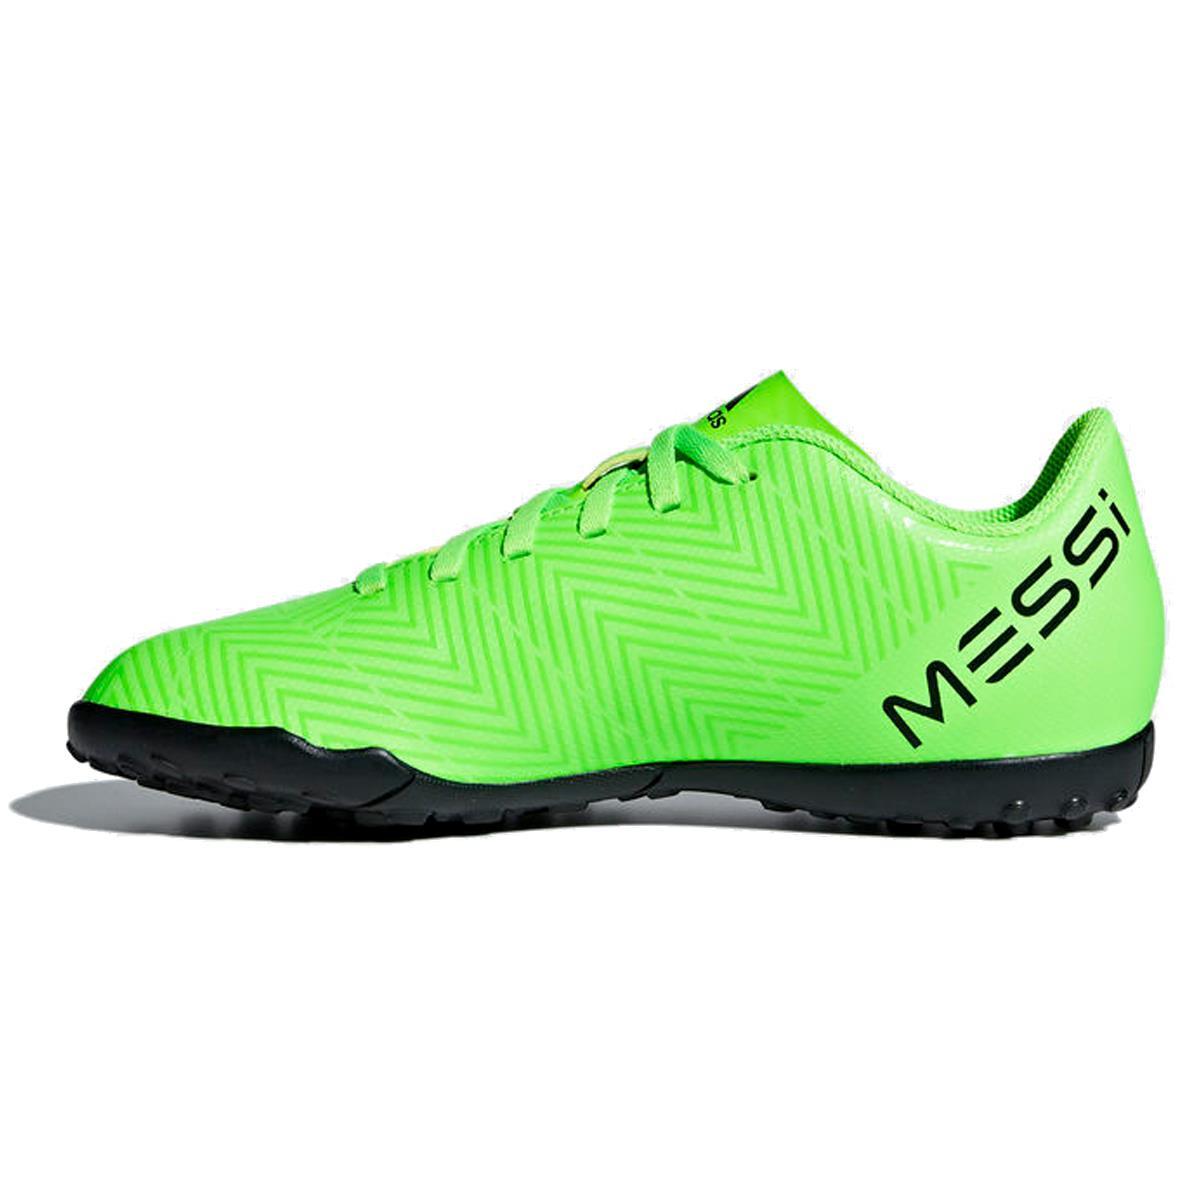 3871bee0bc Chuteira Society Adidas Nemeziz Messi Tango 18.4 Infantil Verde Limão